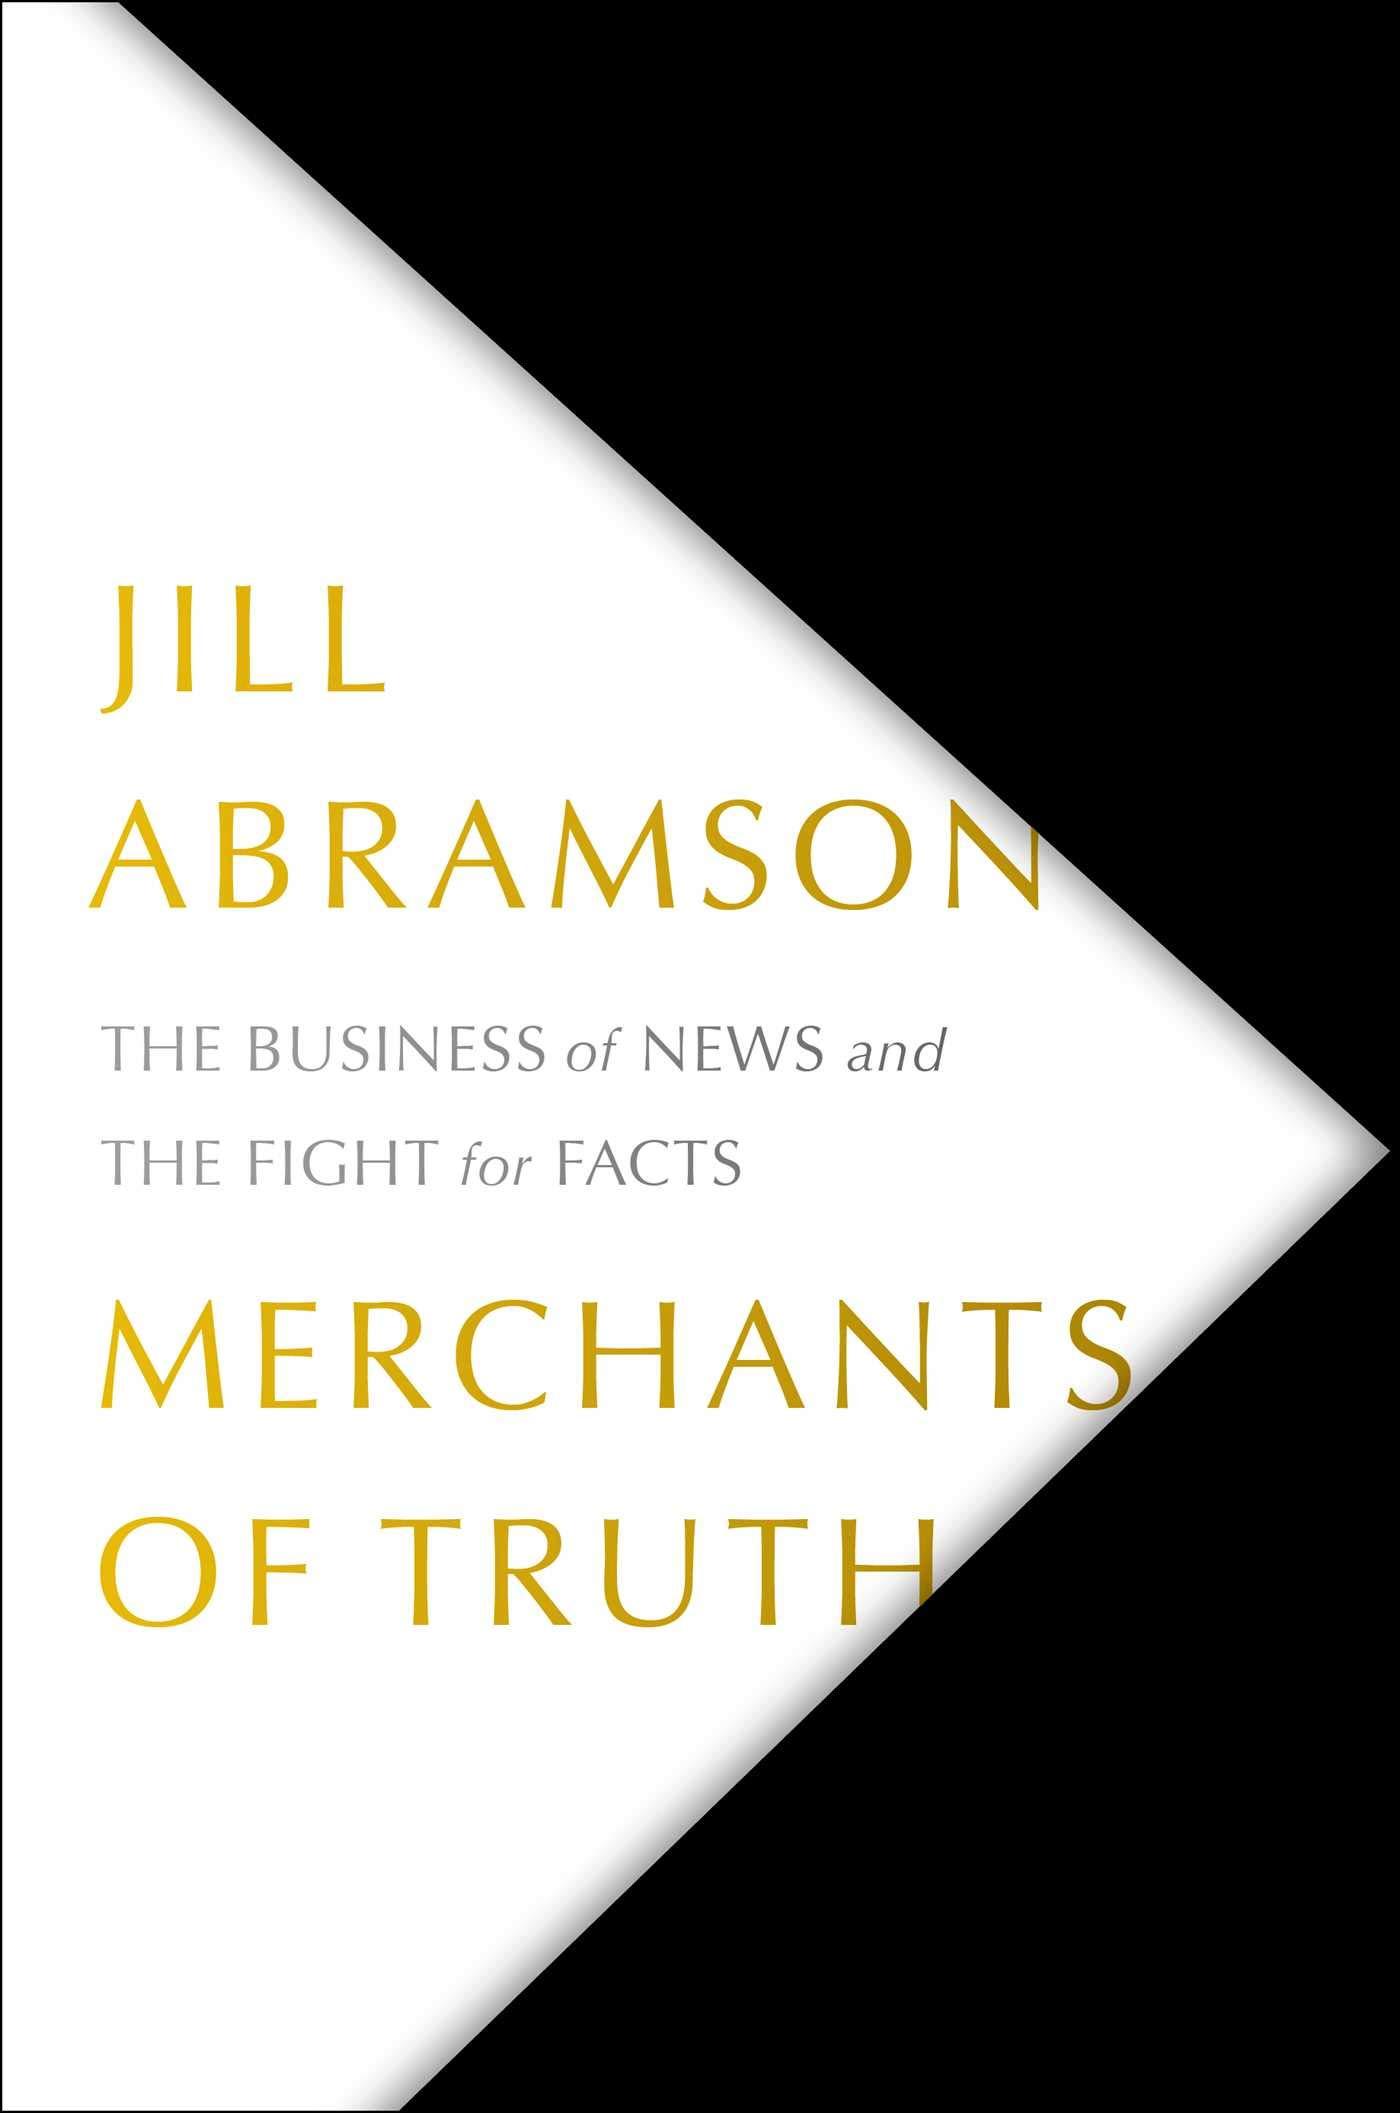 merchants of truth.jpg